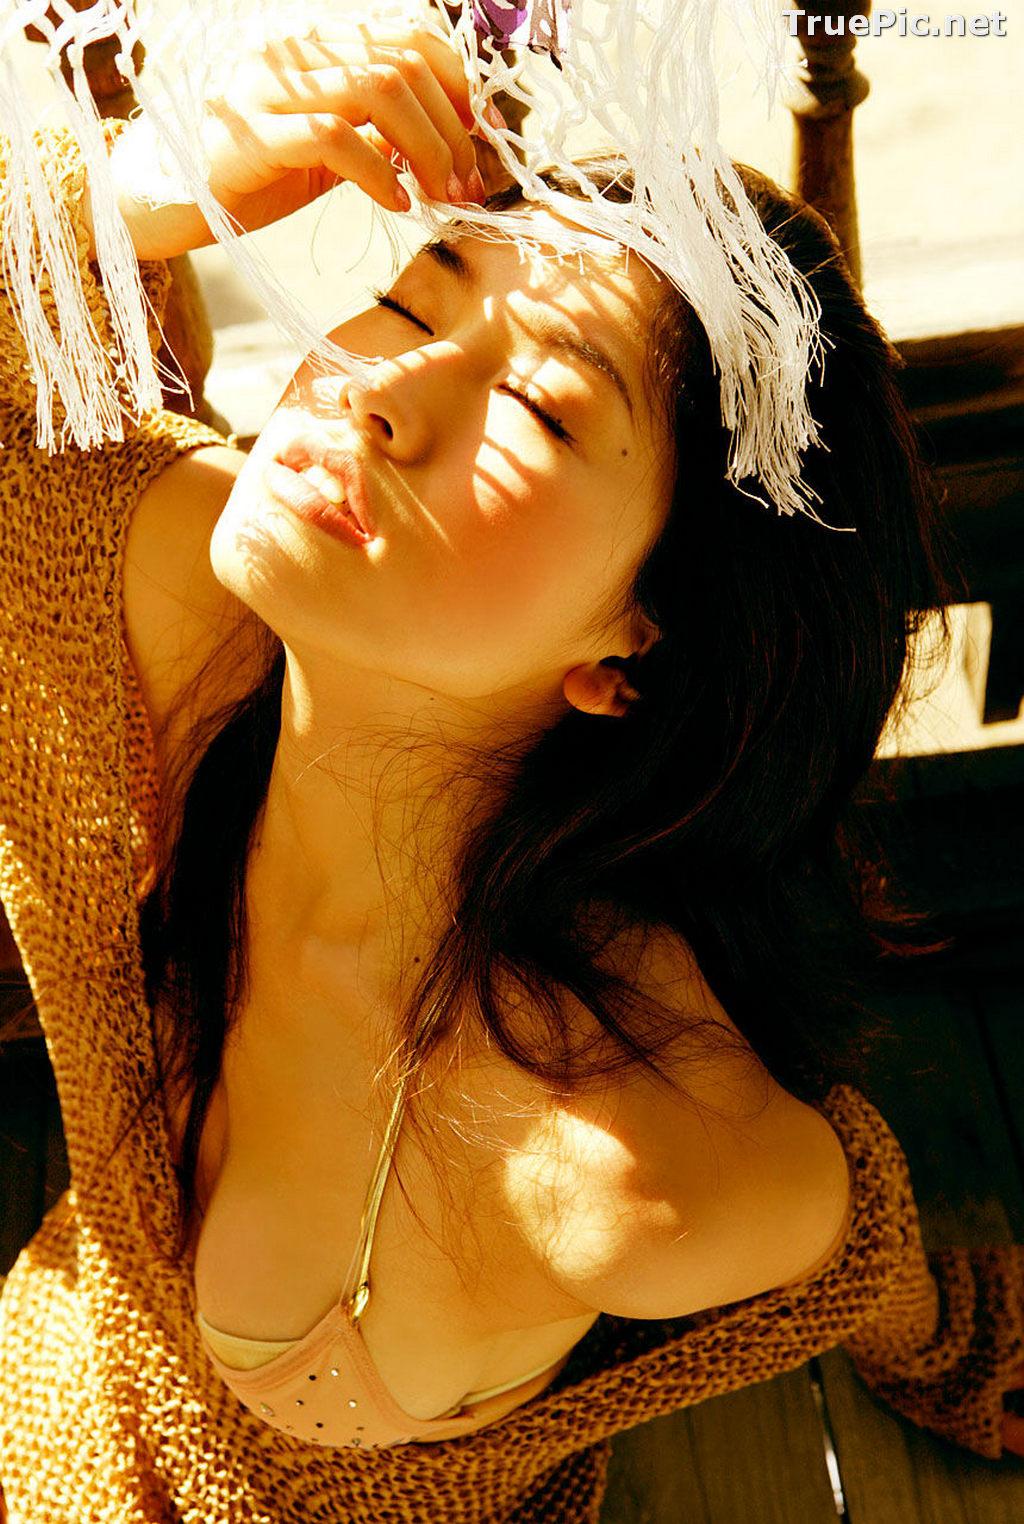 Image Japanese Gravure Idol - Chisato Morishita - Paradise Of Eros Photo - TruePic.net - Picture-7